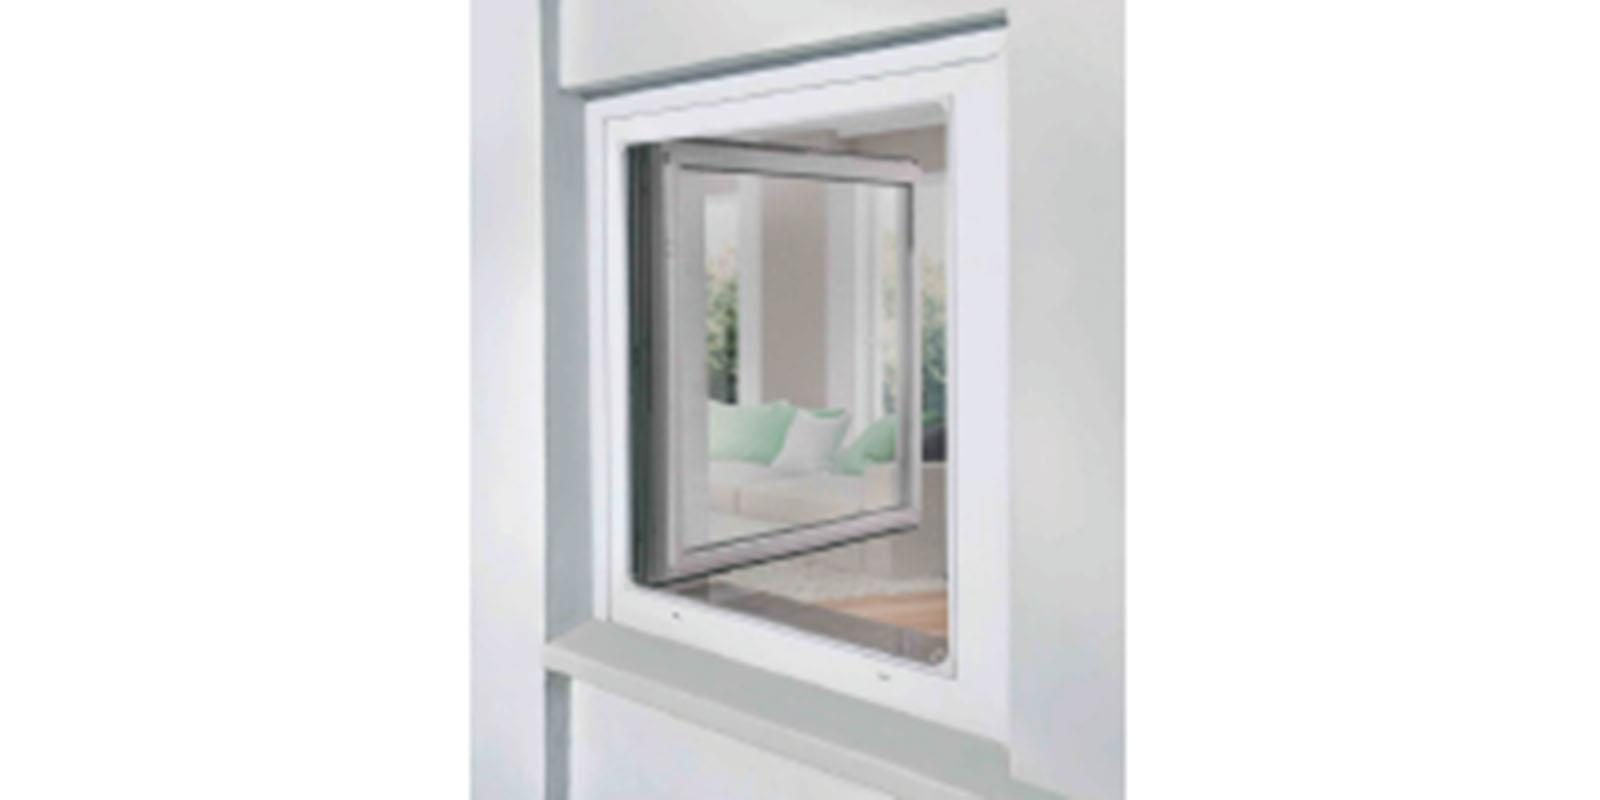 garten insektenschutz magnetisch 110x130cm fliegengitter m ckengitter fenster po ebay. Black Bedroom Furniture Sets. Home Design Ideas